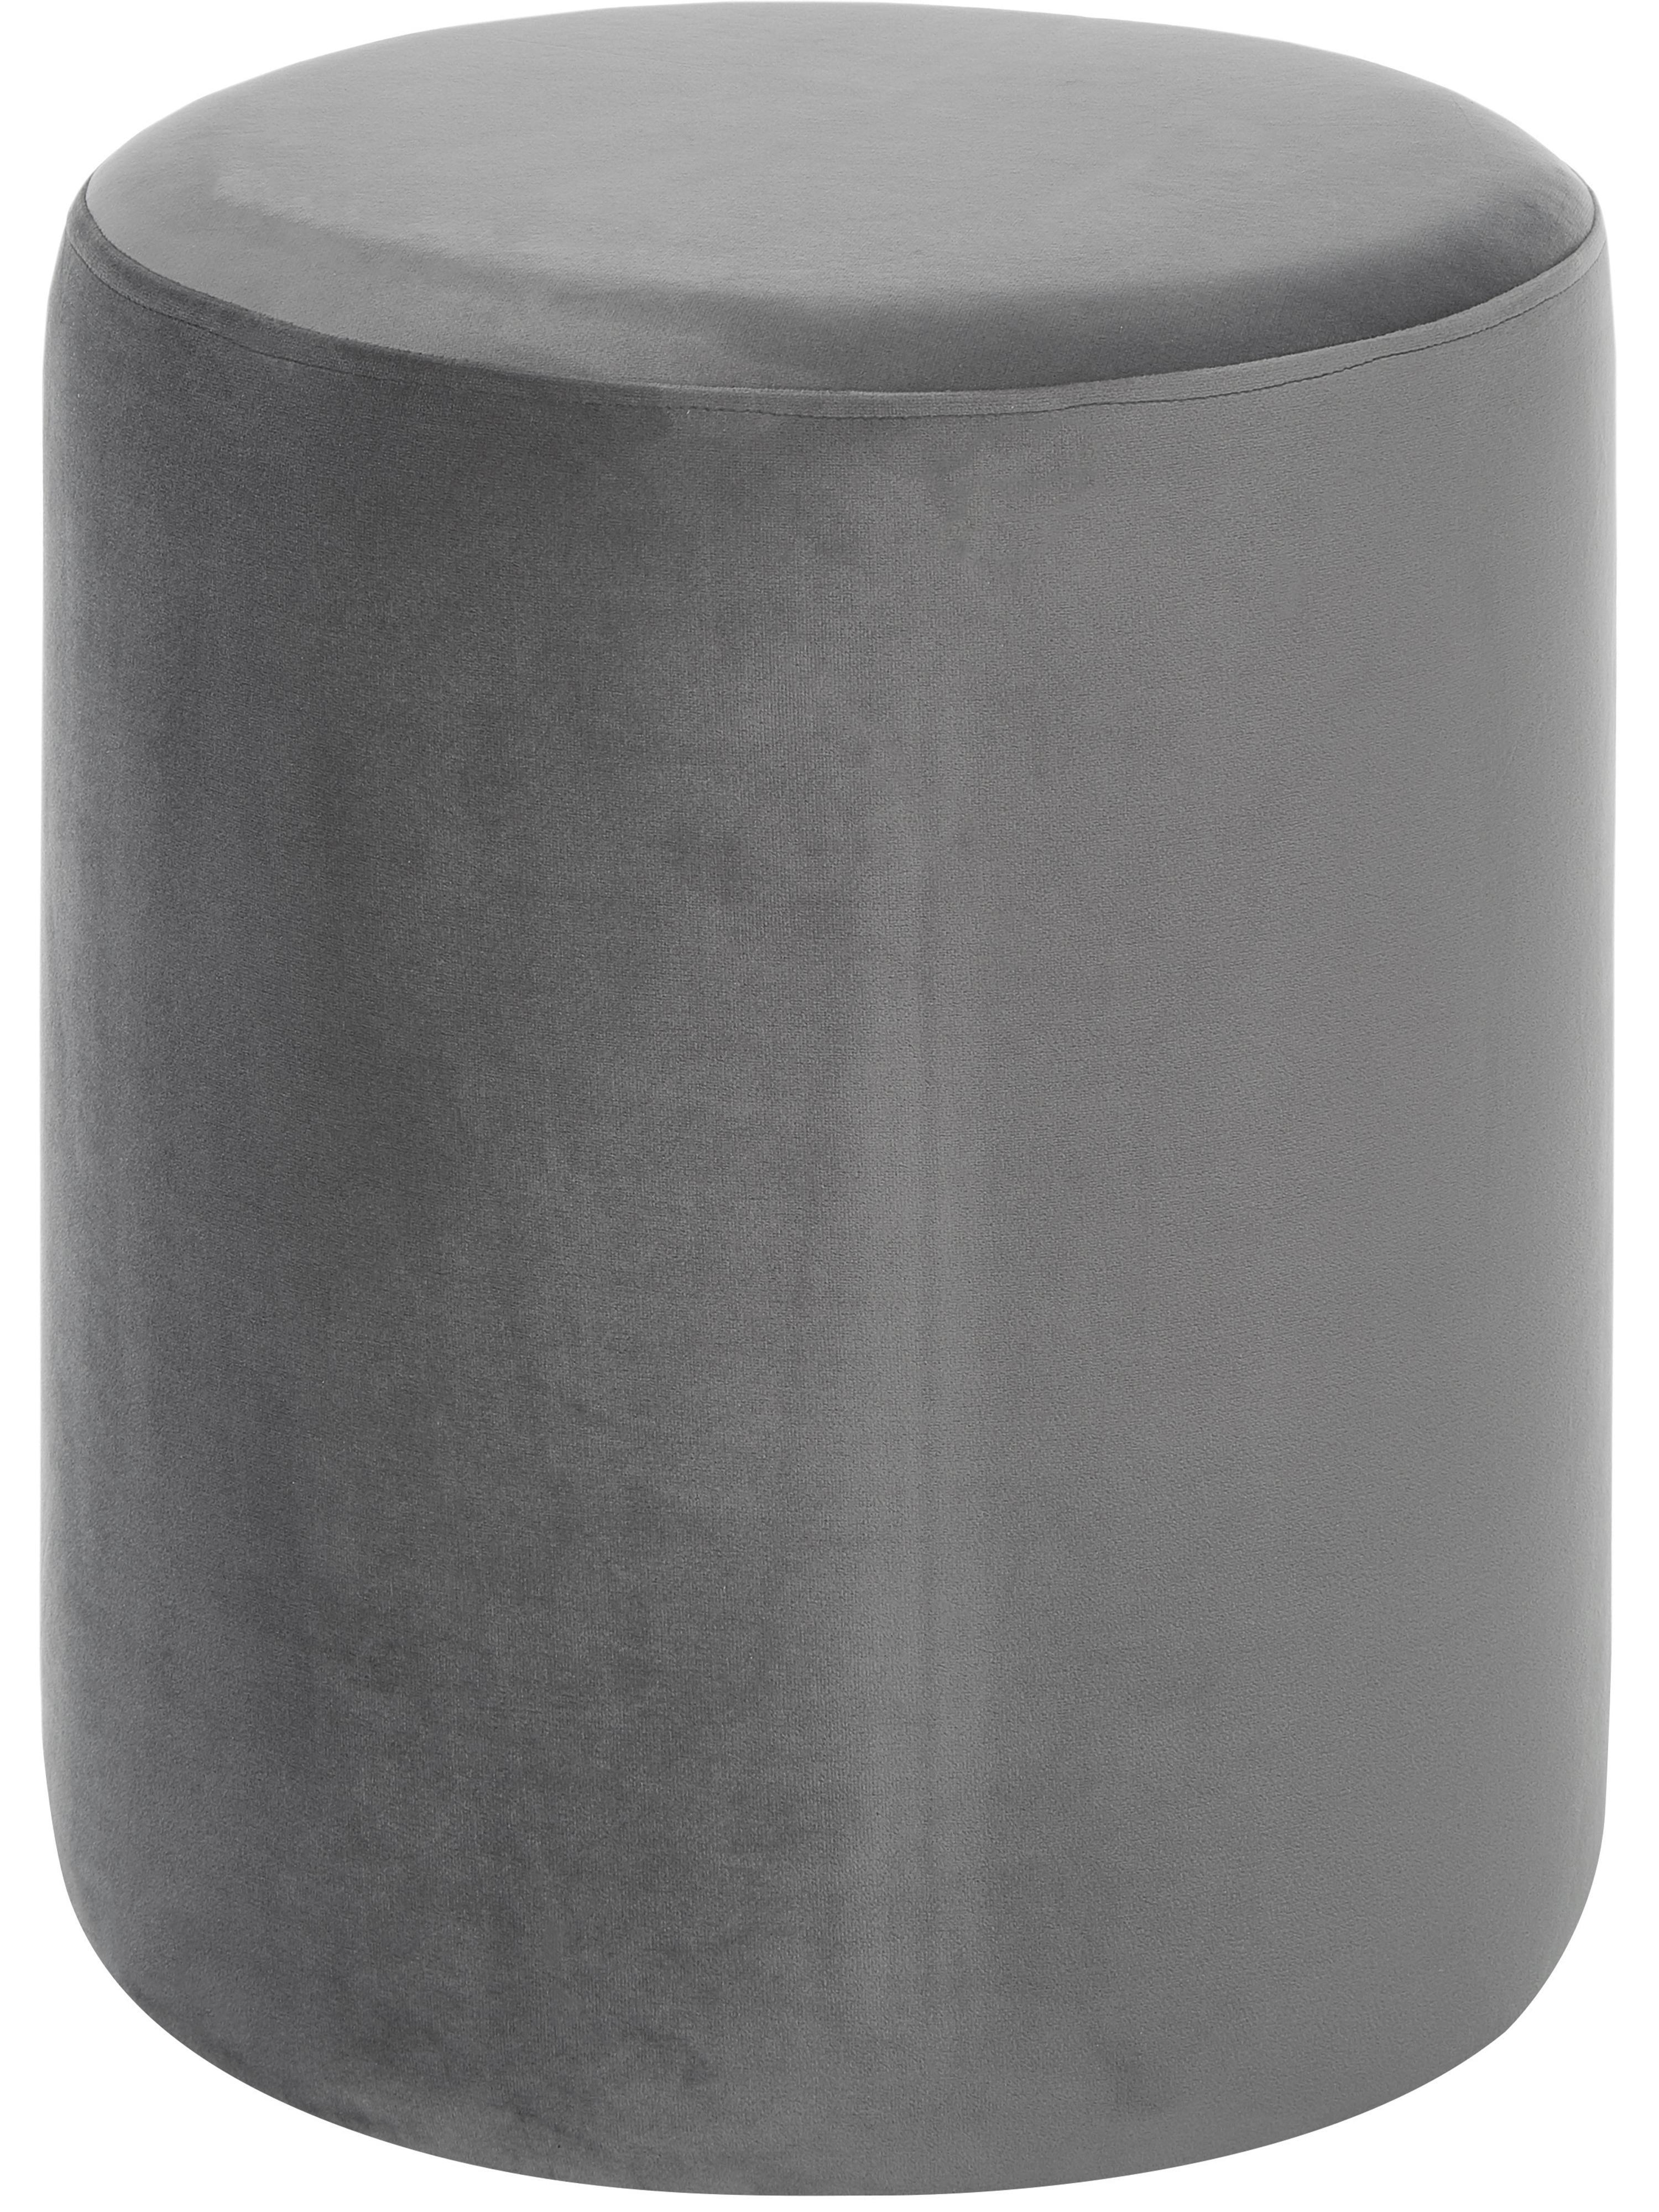 Samt-Hocker Daisy, Bezug: Samt (Polyester) 25.000 S, Rahmen: Sperrholz, Samt Grau, ∅ 38 x H 45 cm